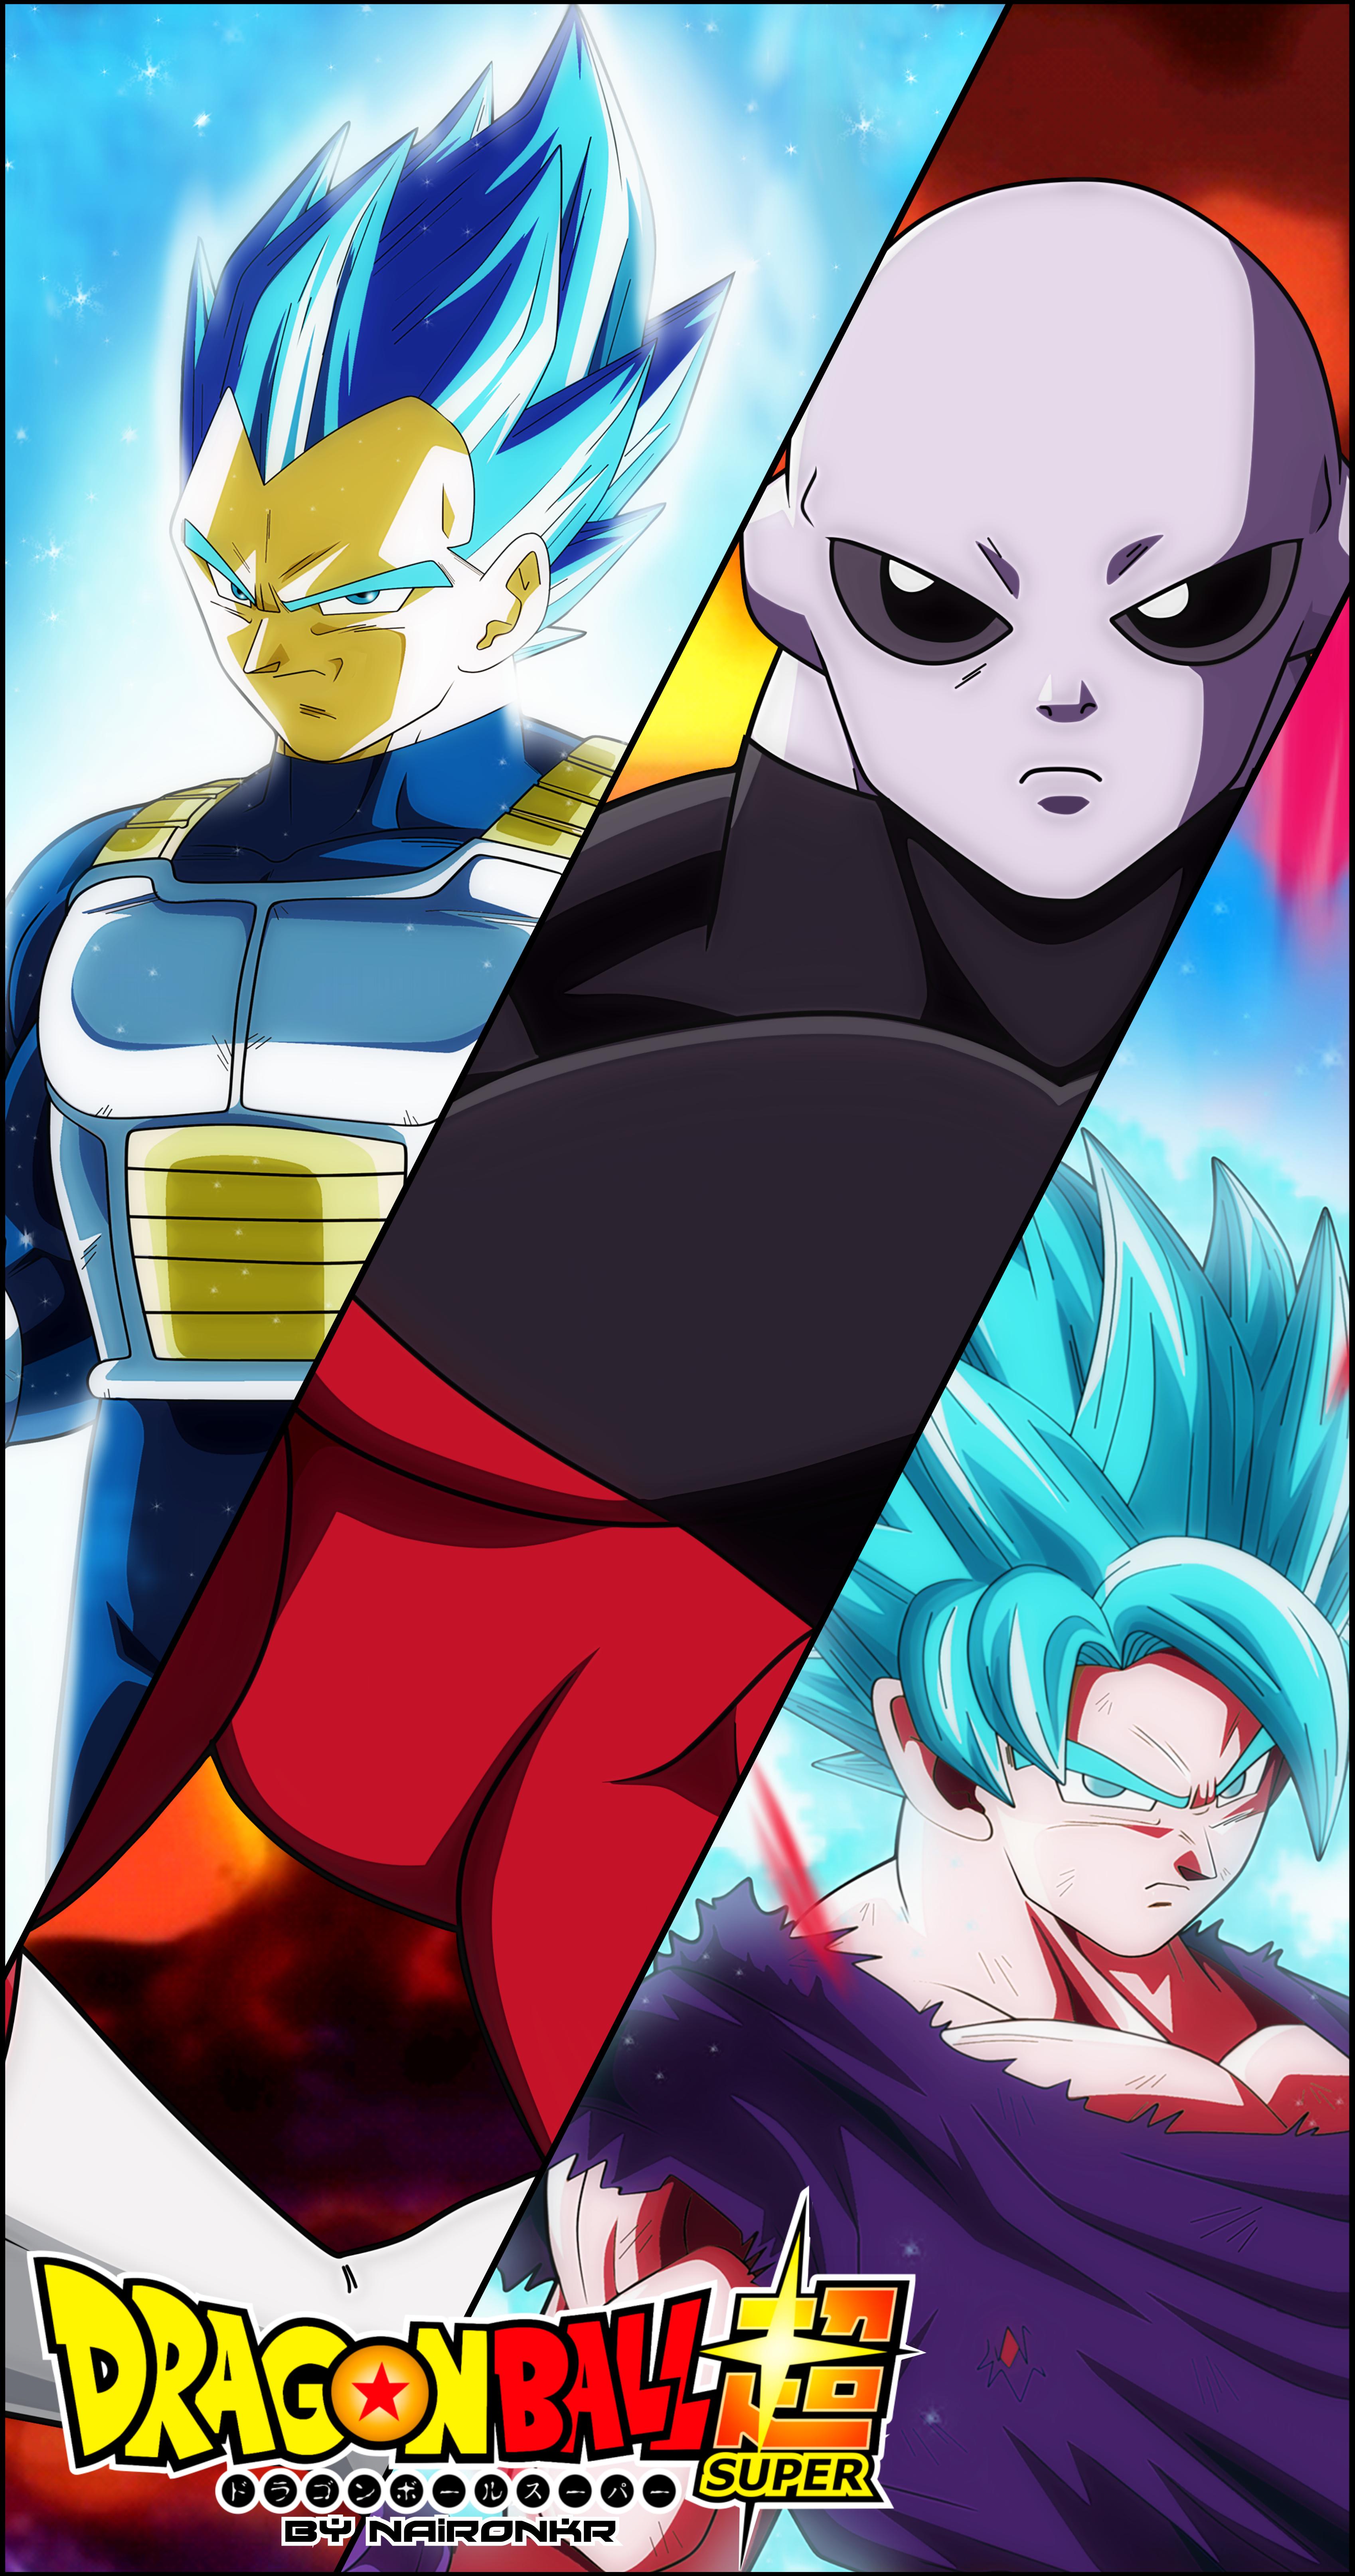 Dragon Ball Super Vs Anime Dragon Ball Super Dragon Ball Super Dragon Ball Super Manga